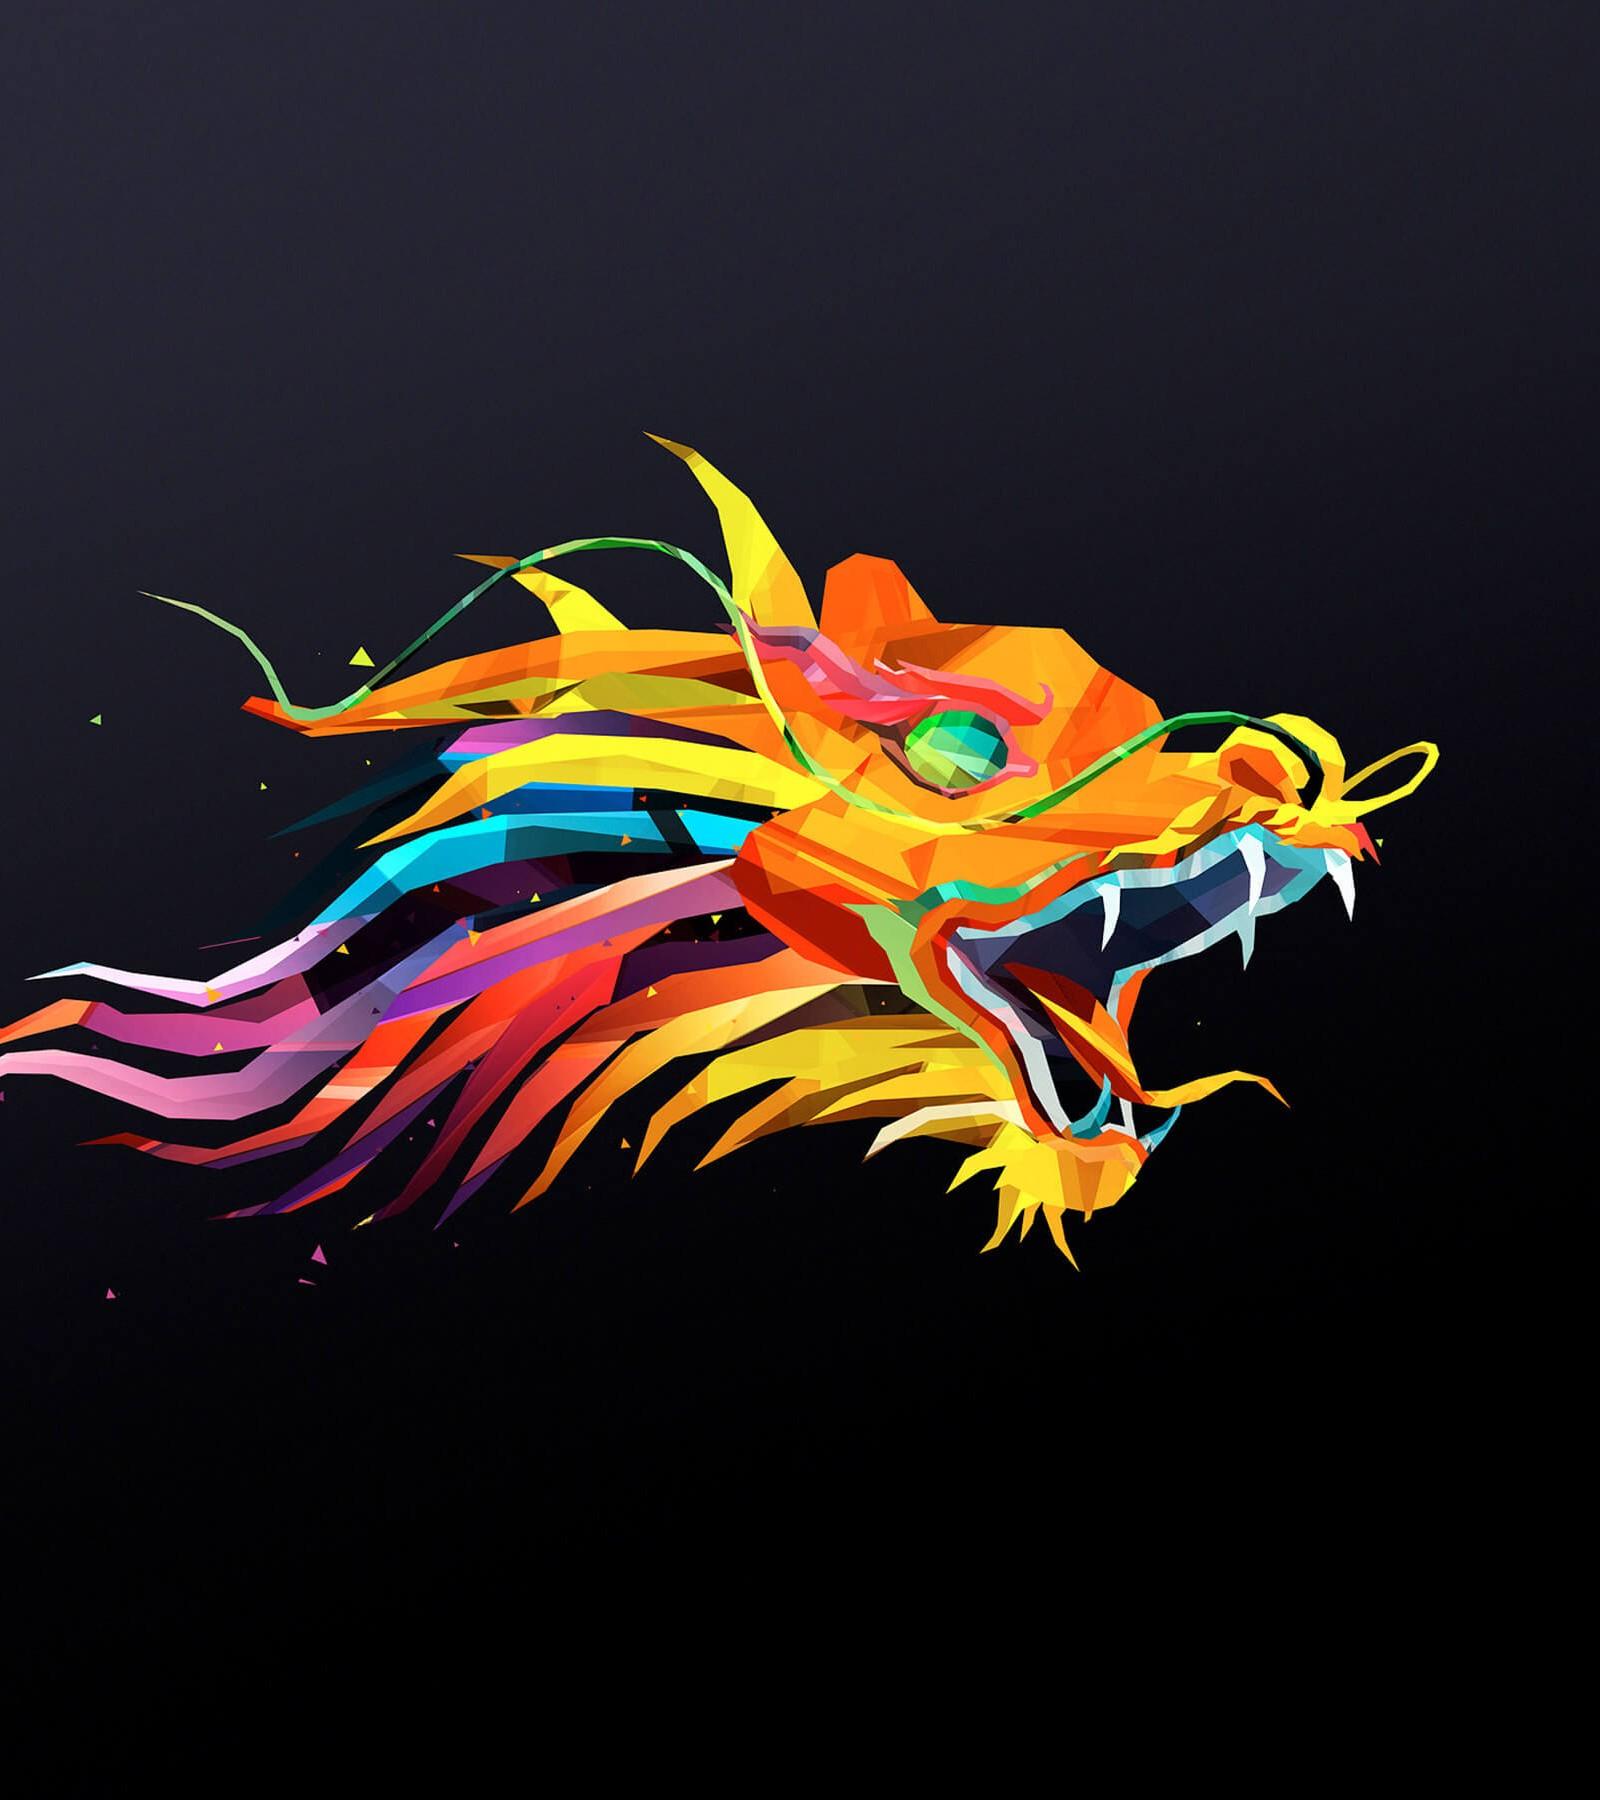 The Dragon HD wallpaper for Kindle Fire HDX 89   HDwallpapersnet 1600x1800